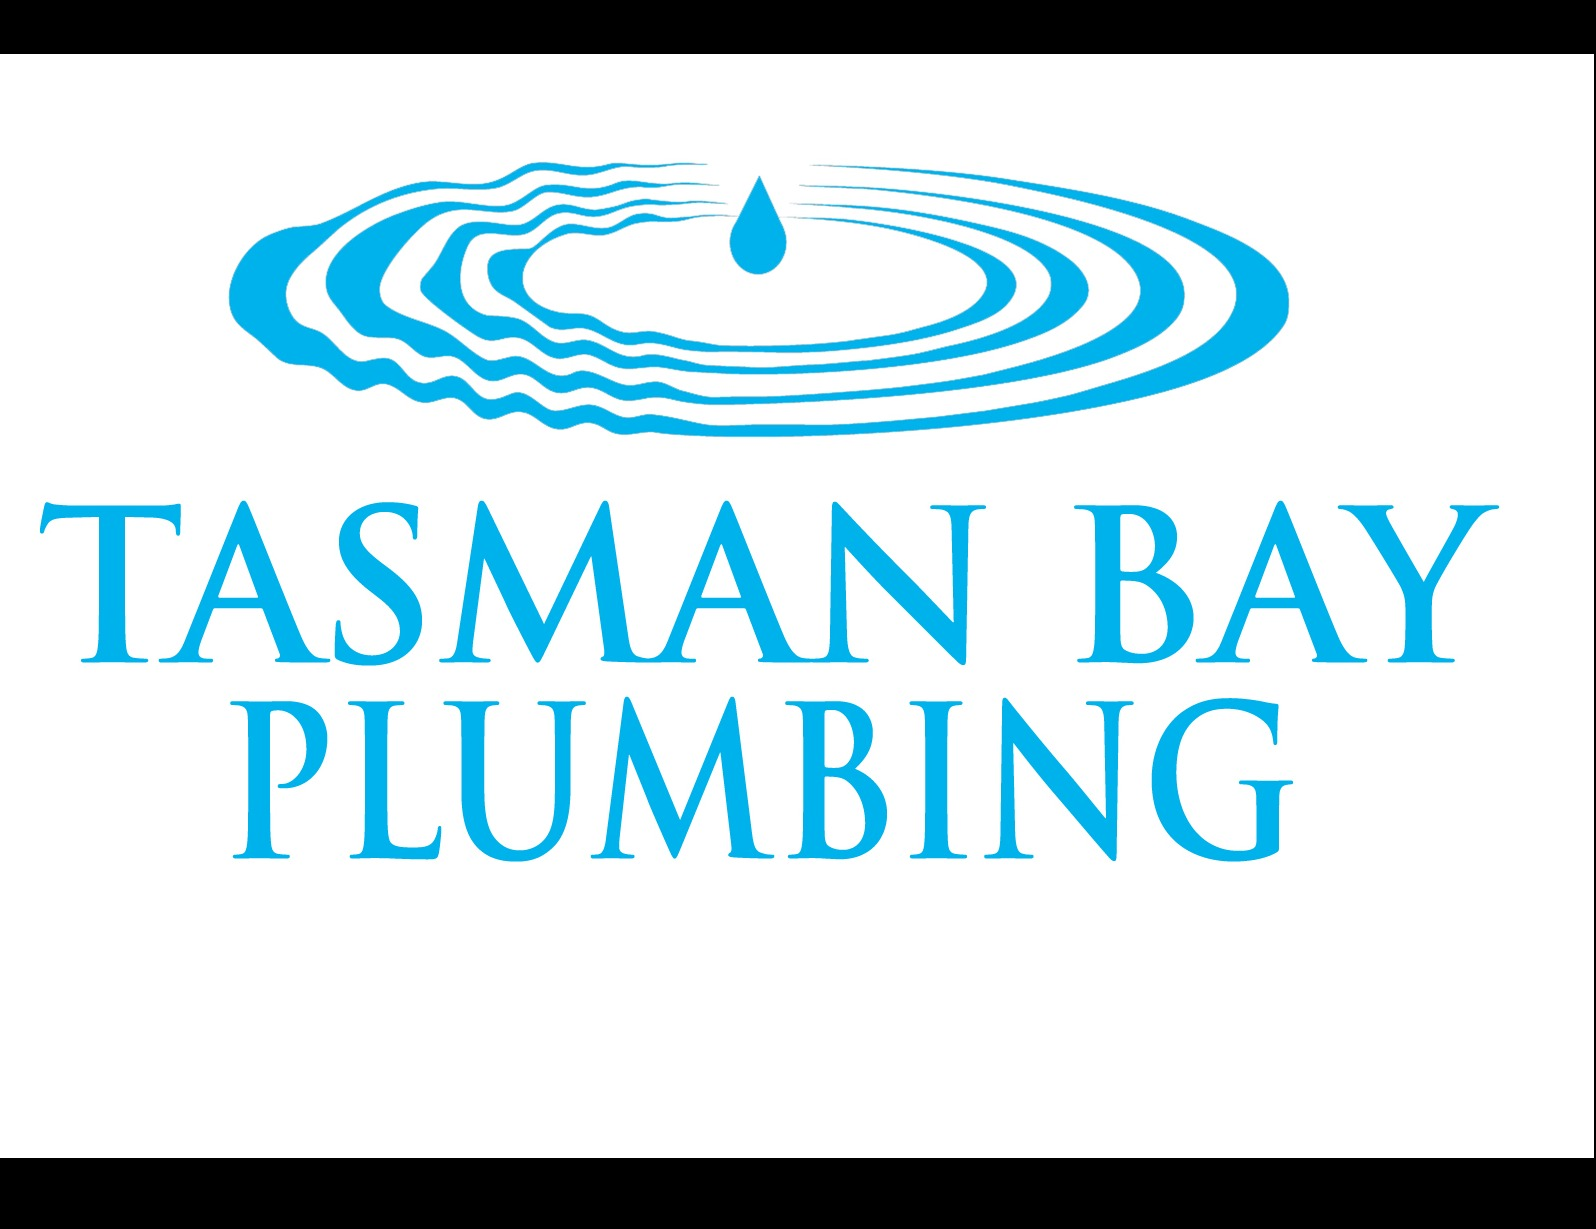 Tasman Bay Plumbing Services Ltd